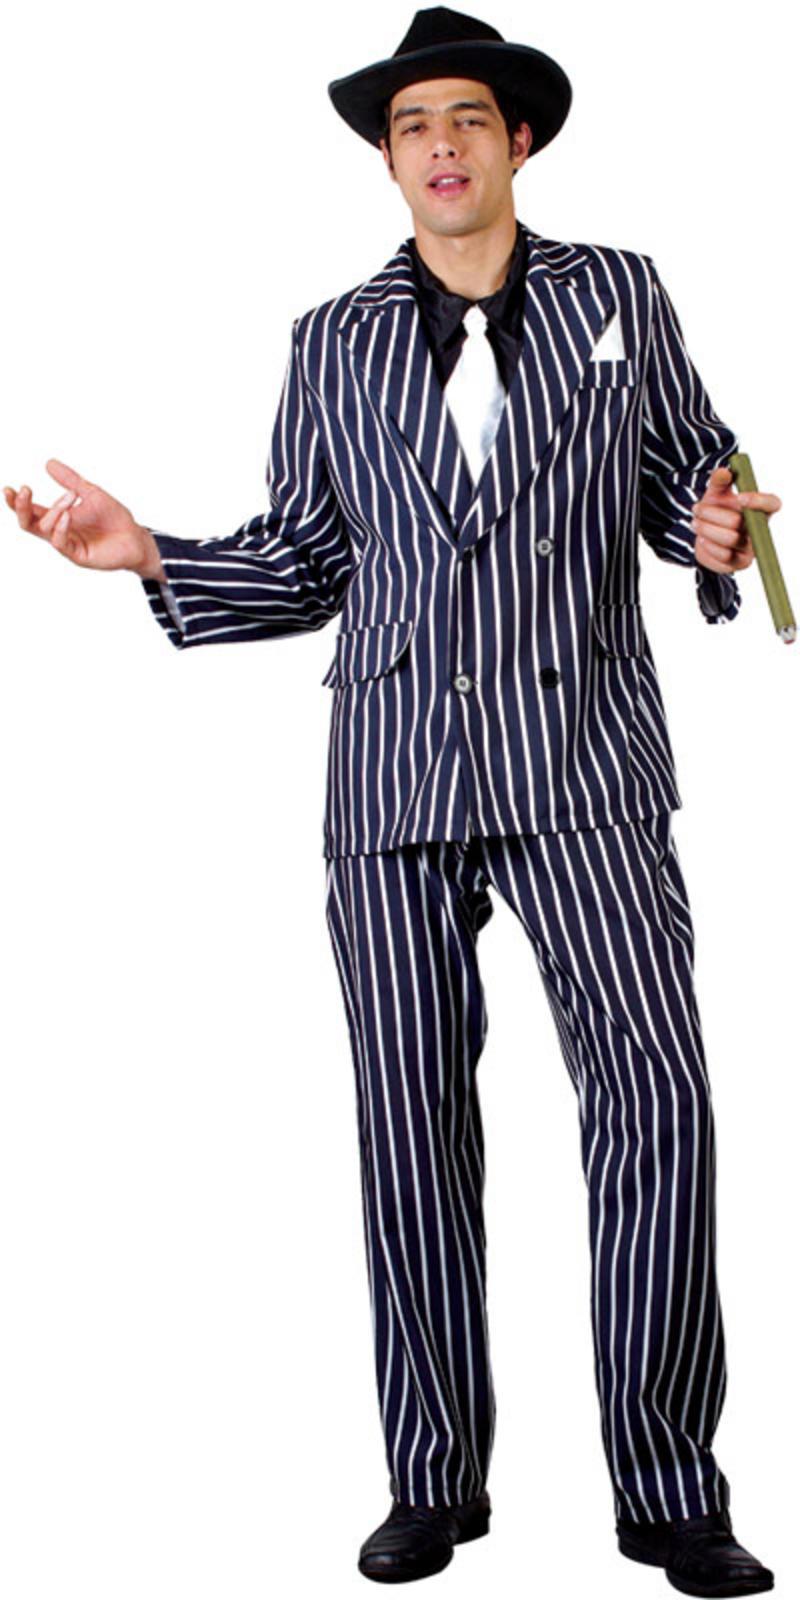 ... Mafia Gangster Godfather Fancy Dress Halloween Costume Thumbnail 2